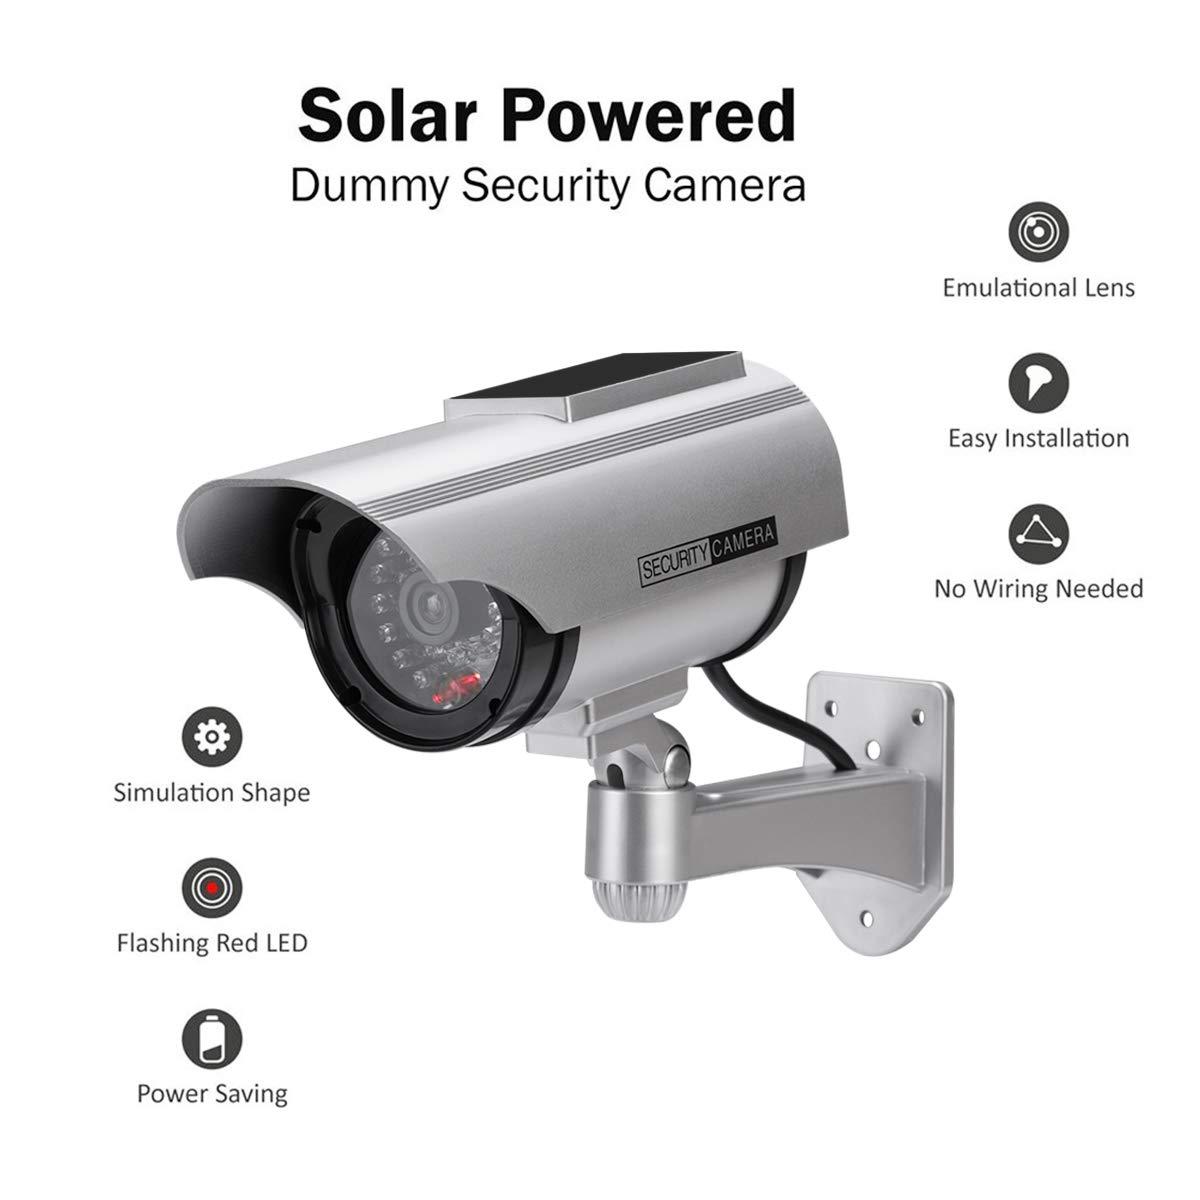 4 Paquete C/ámara Falsa C/ámara de vigilancia Falsa simulada con Bala Solar C/ámara Domo CCTV de Seguridad con luz LED Intermitente para Exteriores Interiores hogar Negocios